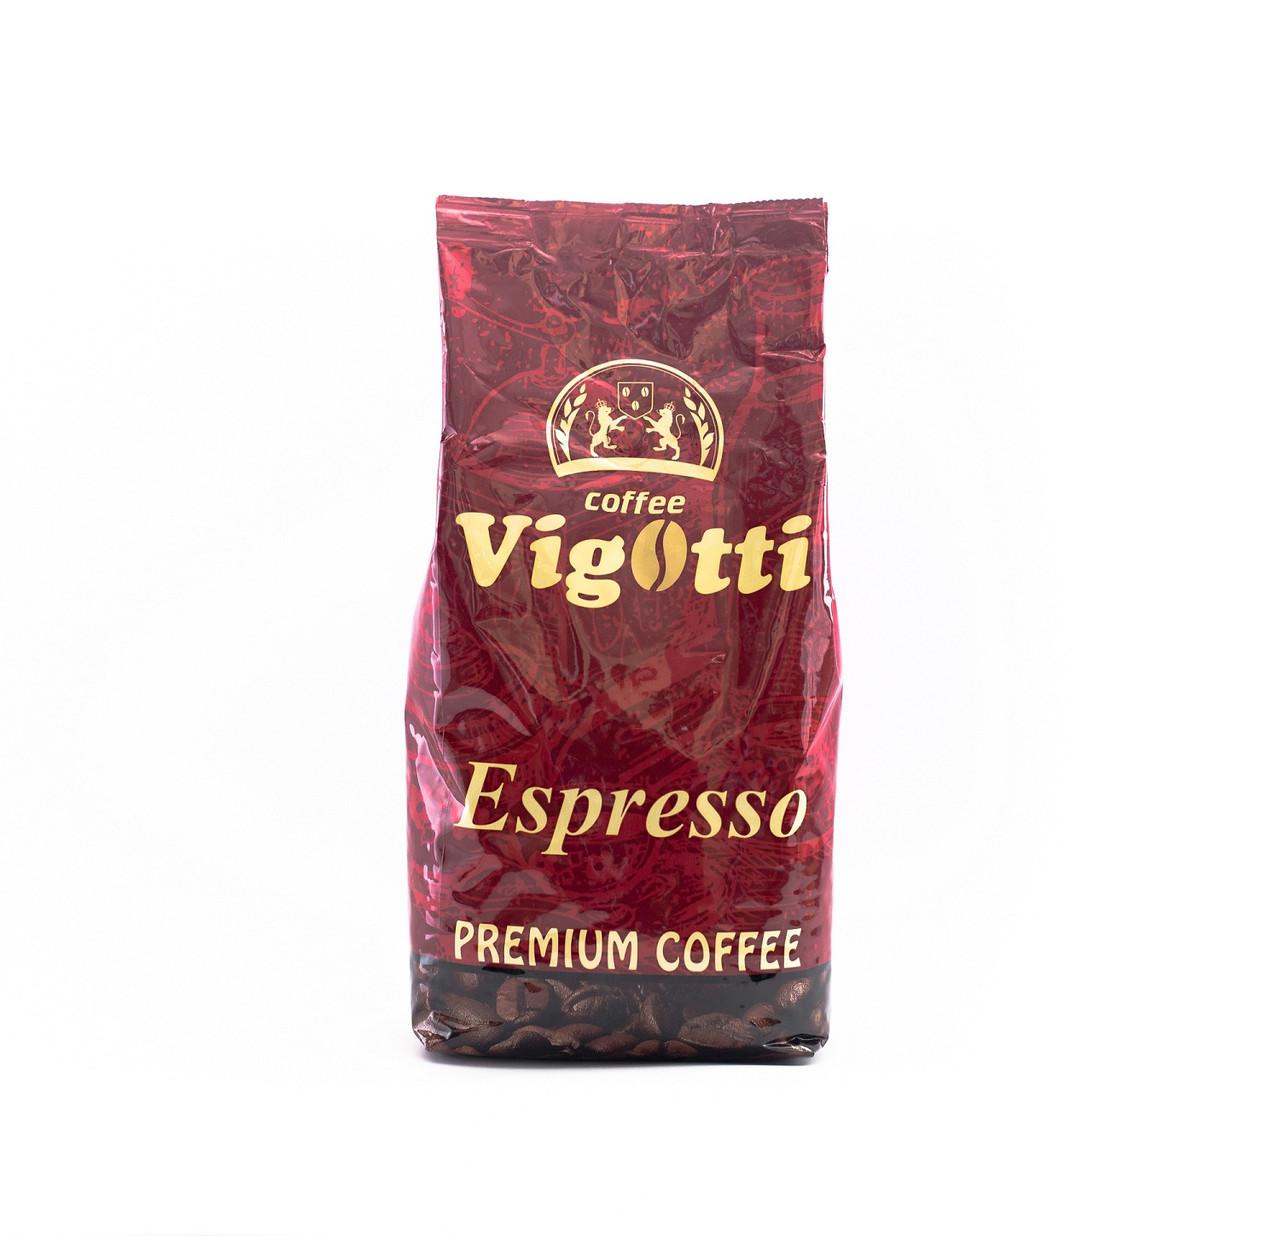 Кофе в зернах Vigotti Espresso Coffee кава купаж Арабика и Робуста